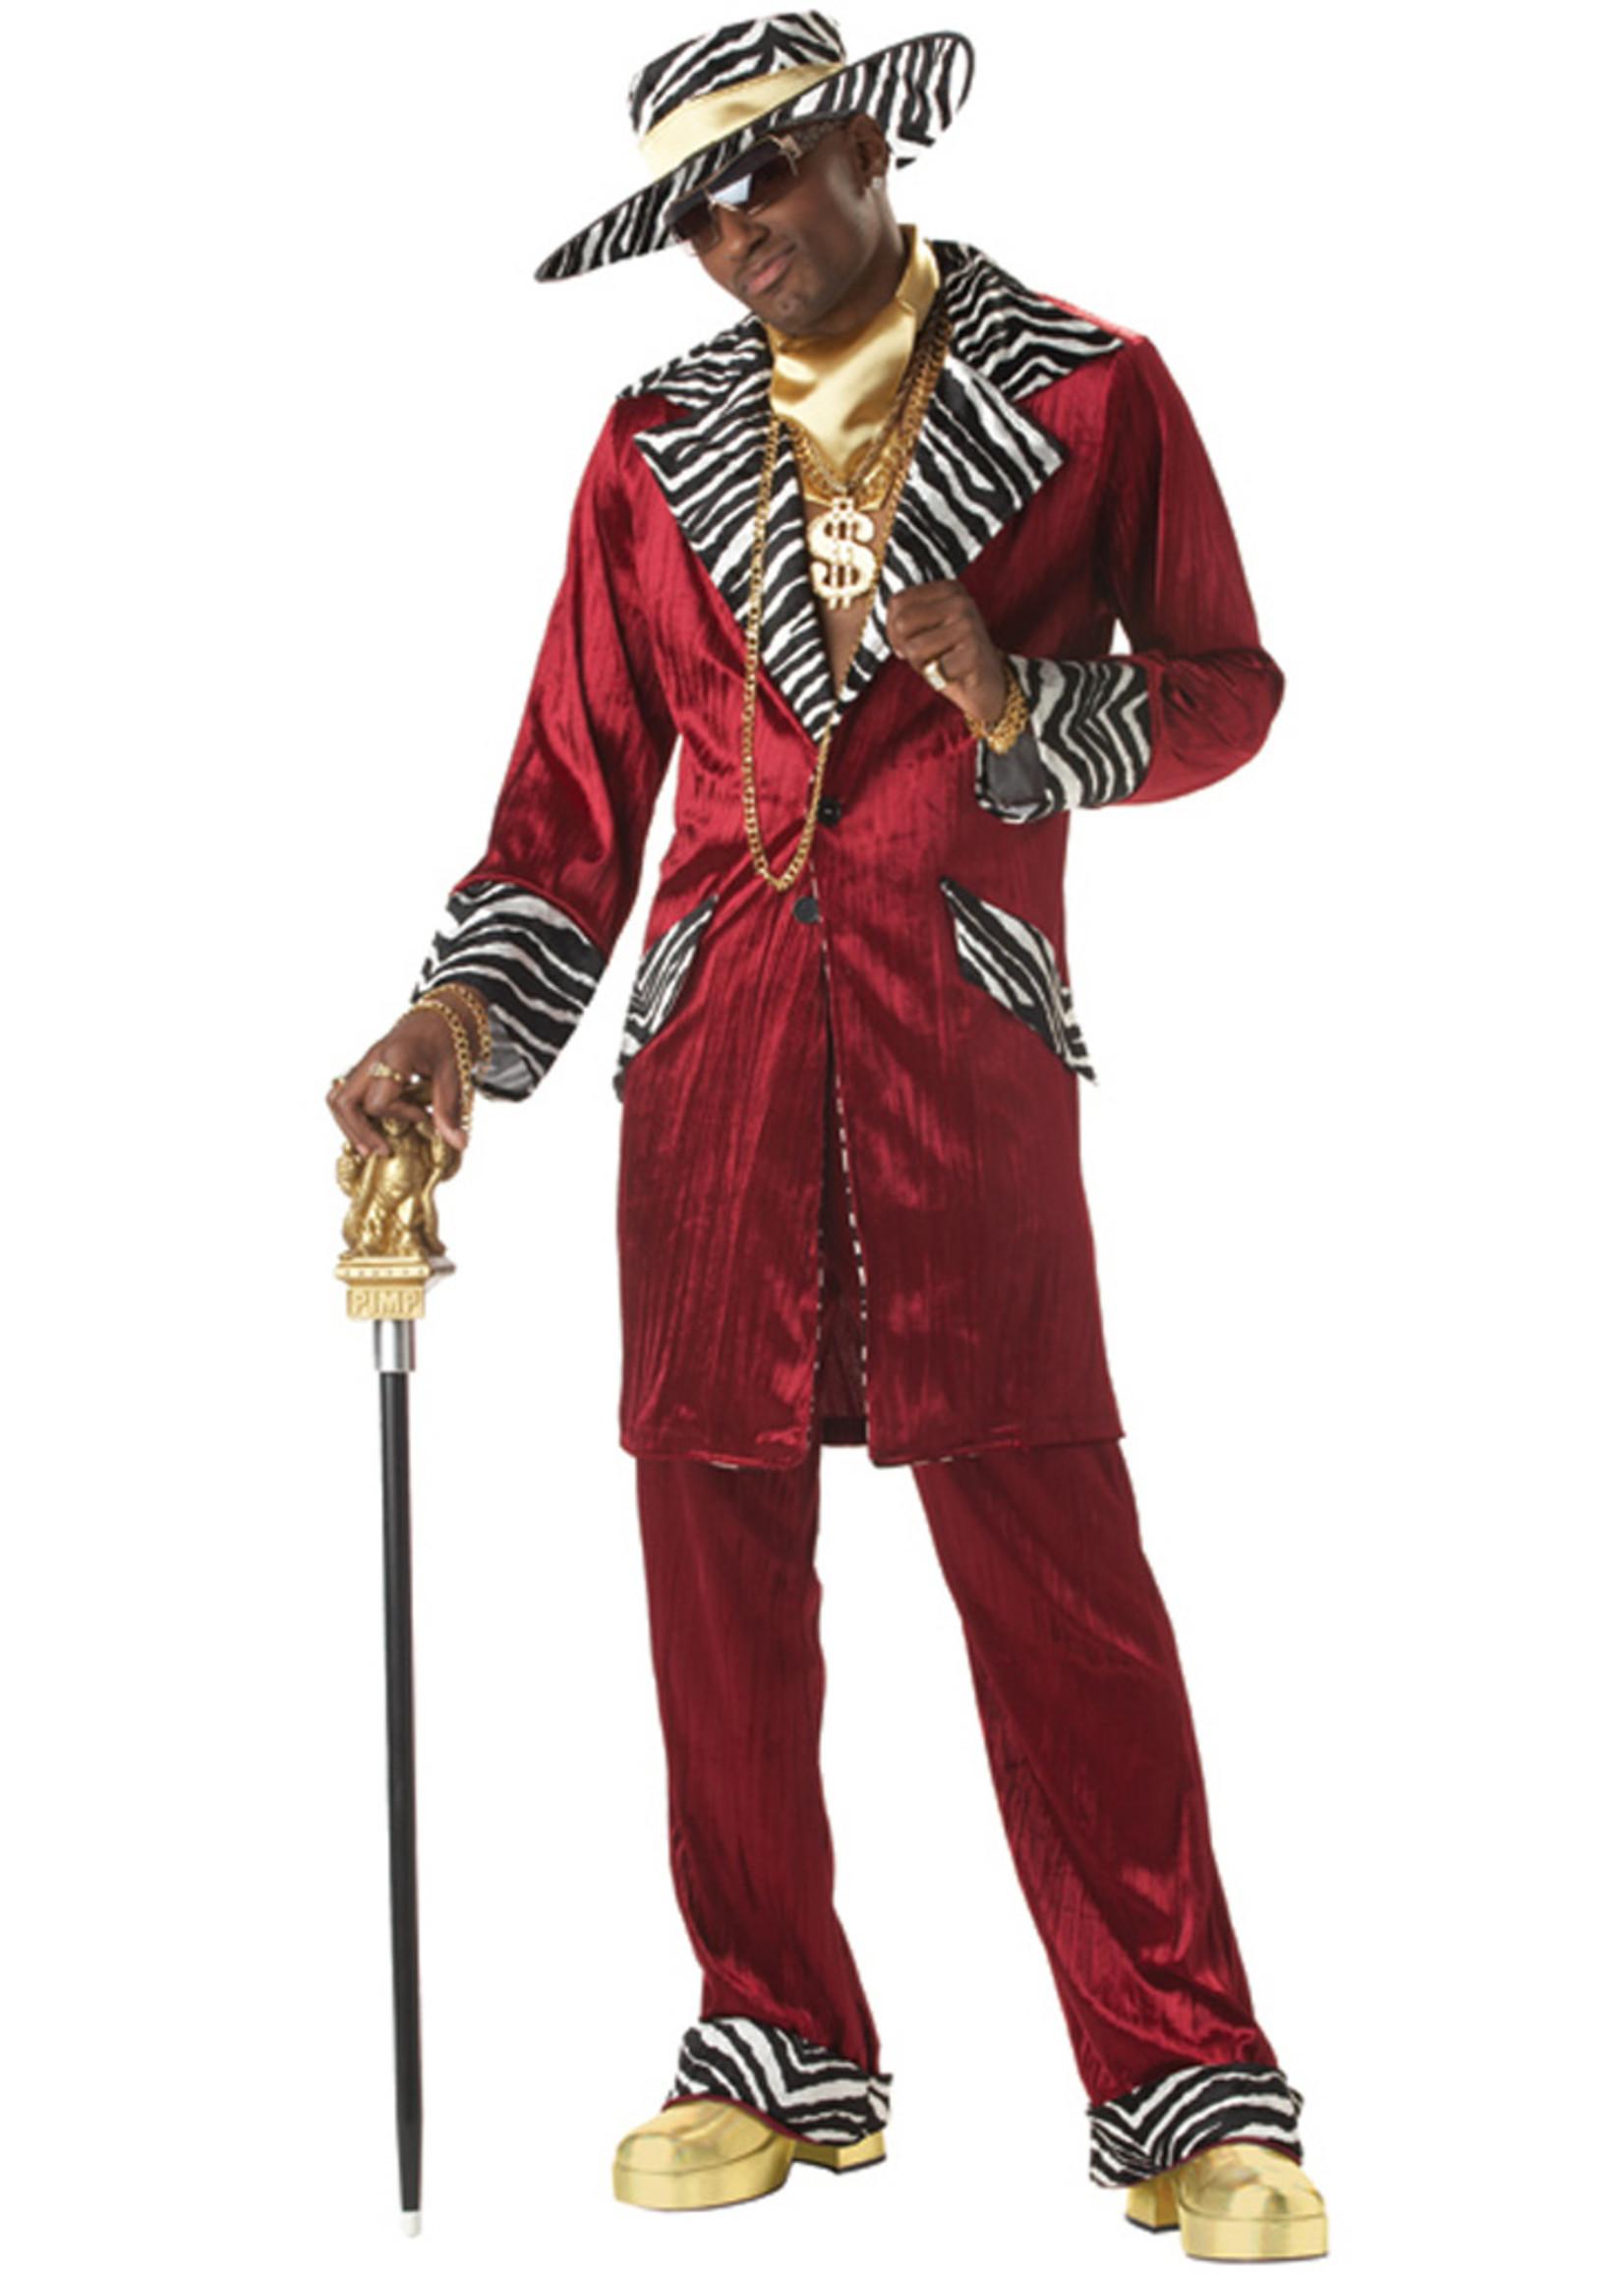 Sweet Daddy Beaujolais Costume - Men's